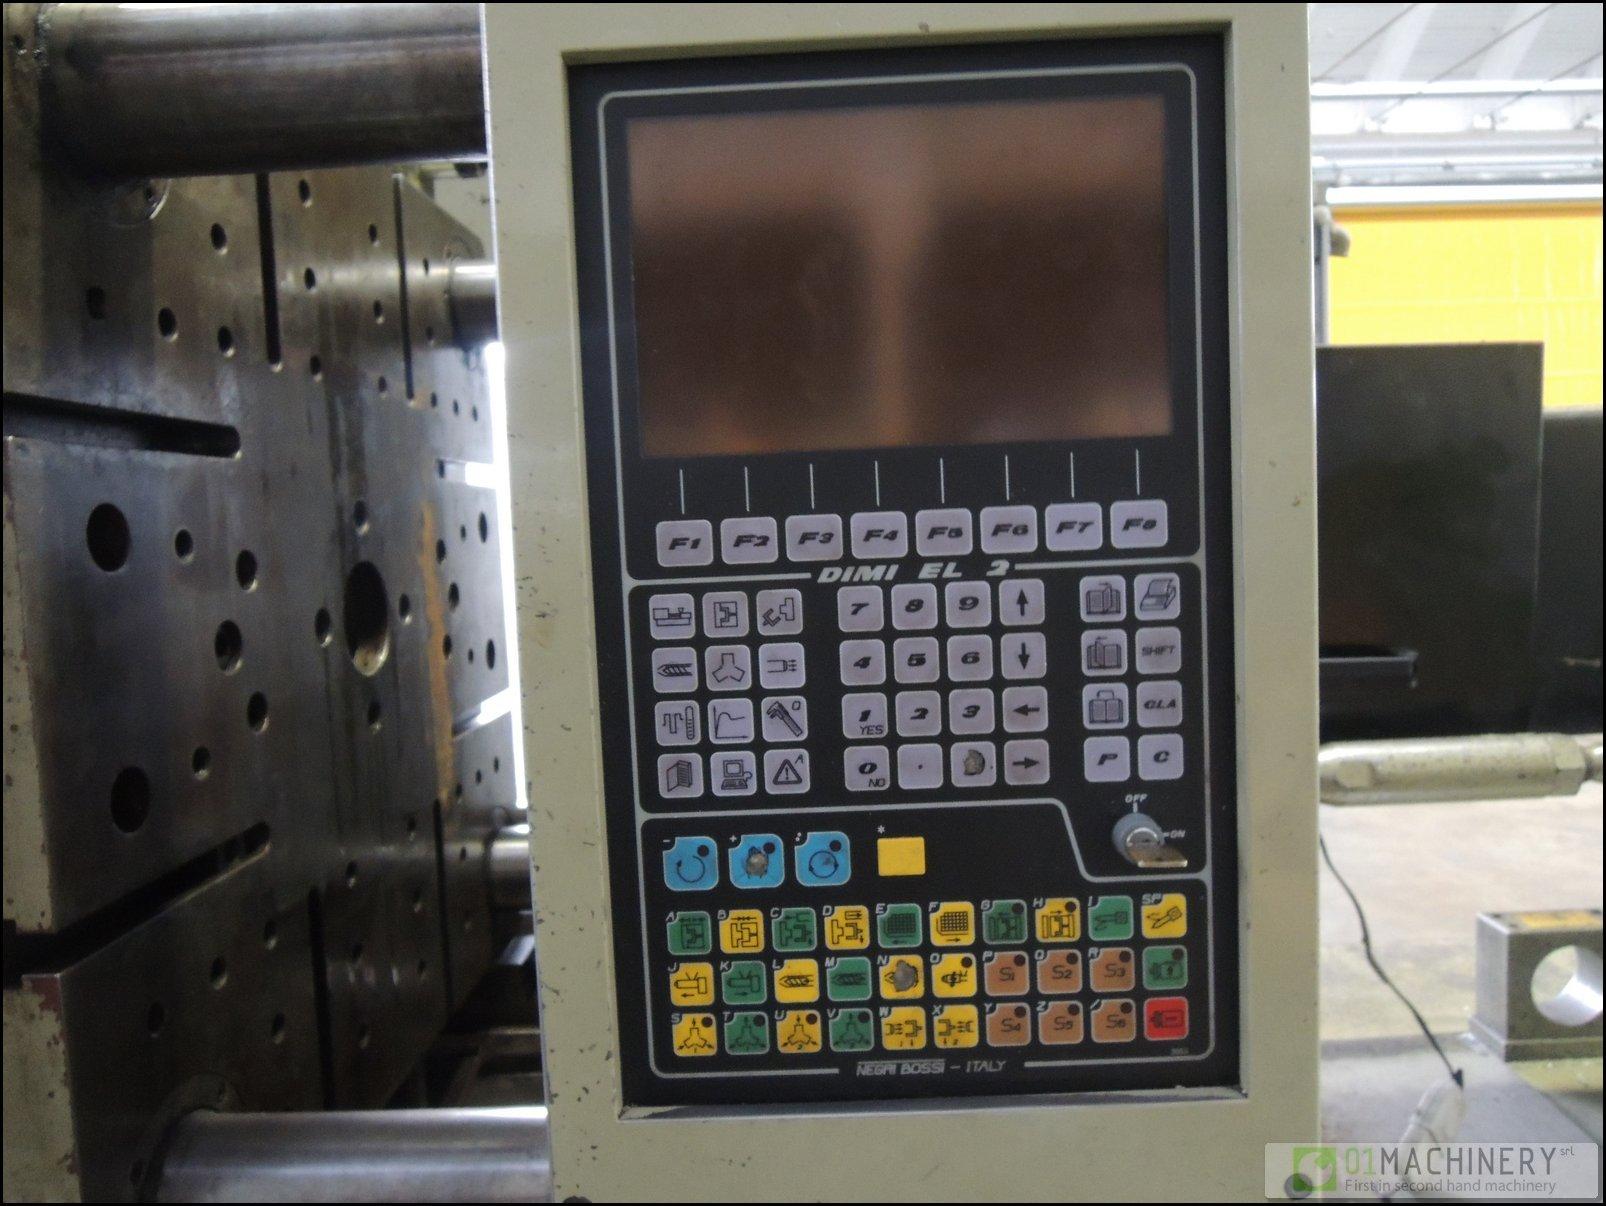 negri bossi injection molding machine